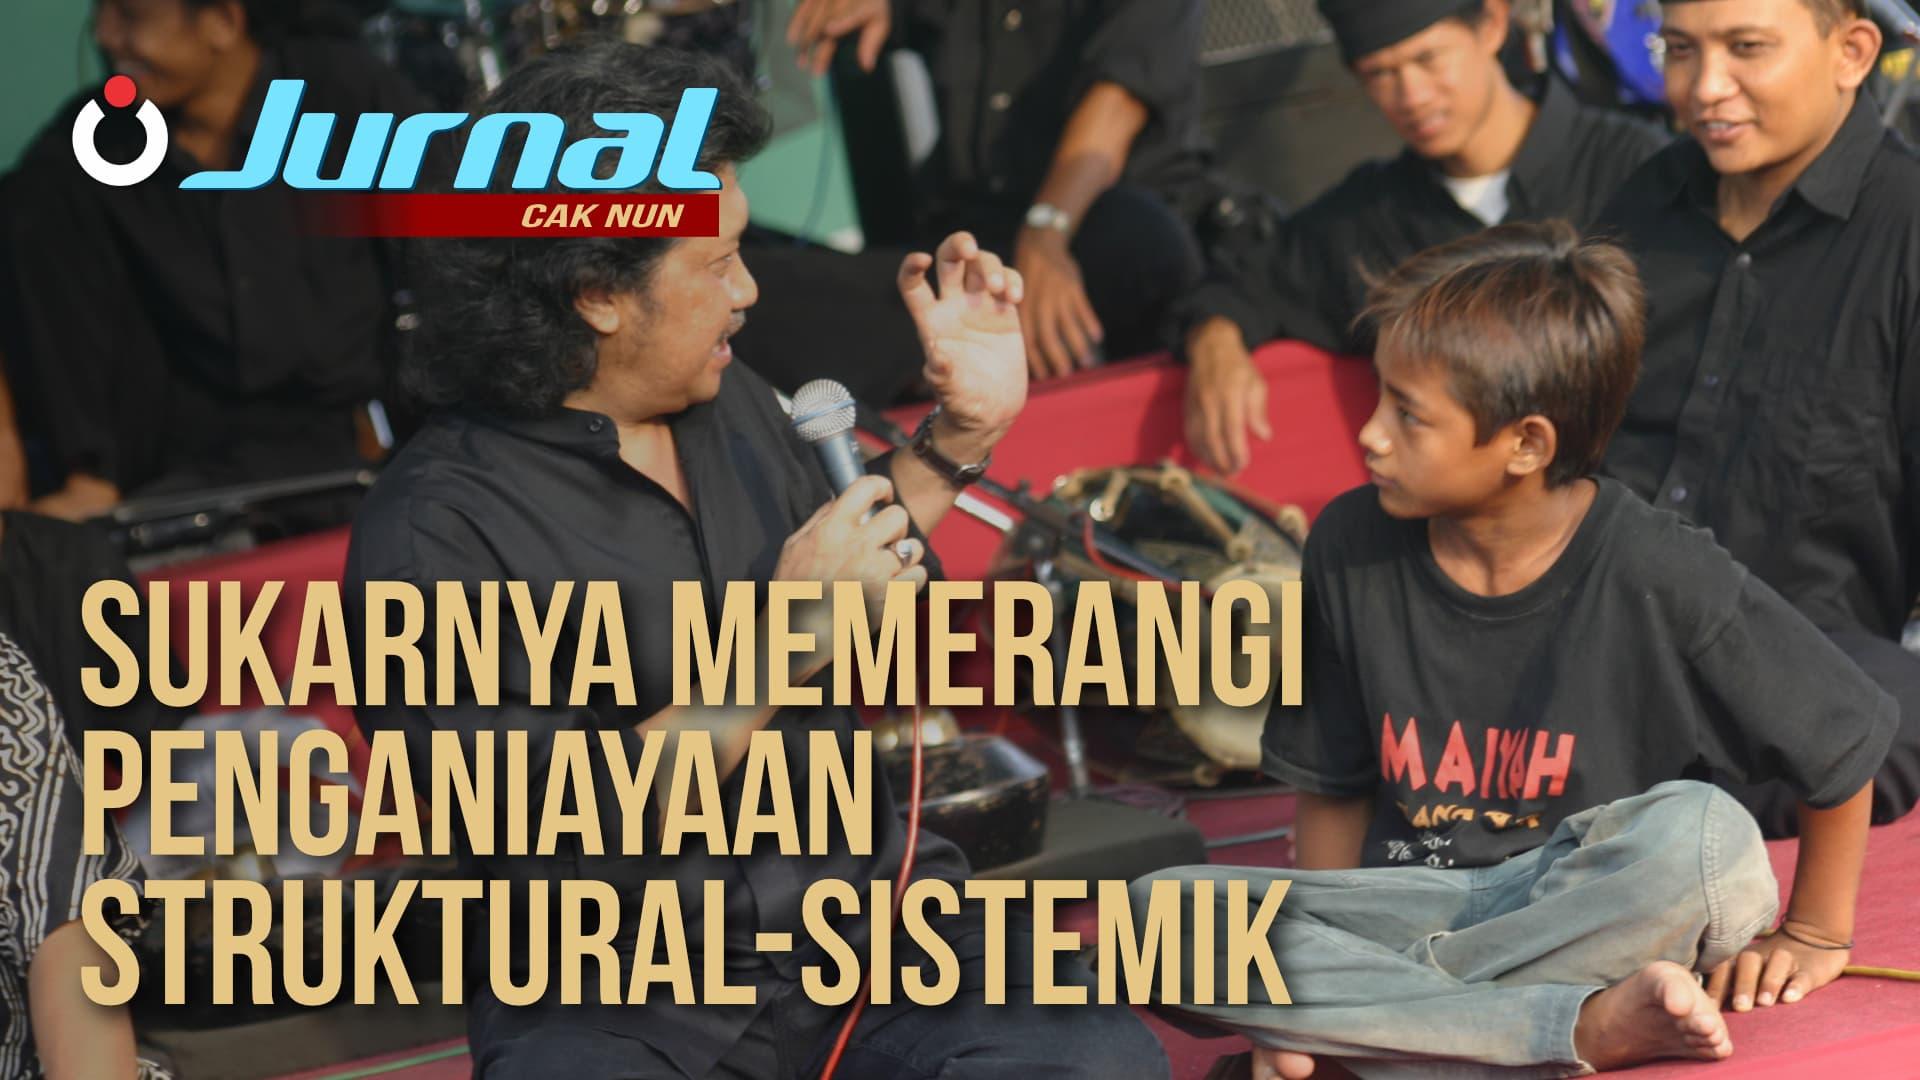 Jurnal Cak Nun – Sukarnya Memerangi Penganiayaan Struktural-Sistemik